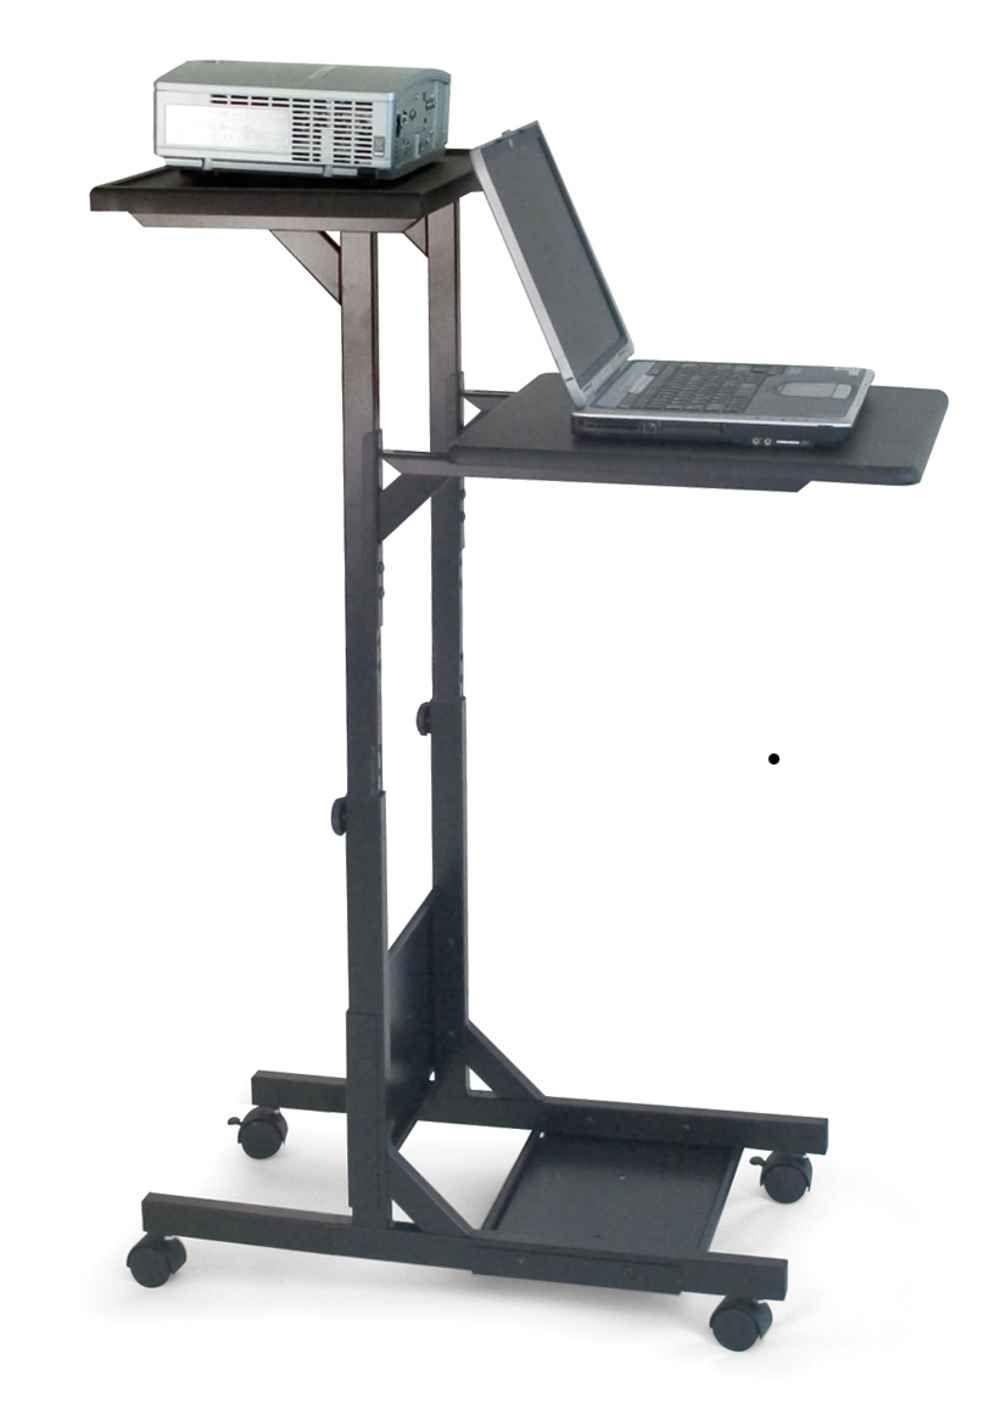 h wilson mobile laptop stands for presentation laptop stand pinterest laptop stand. Black Bedroom Furniture Sets. Home Design Ideas